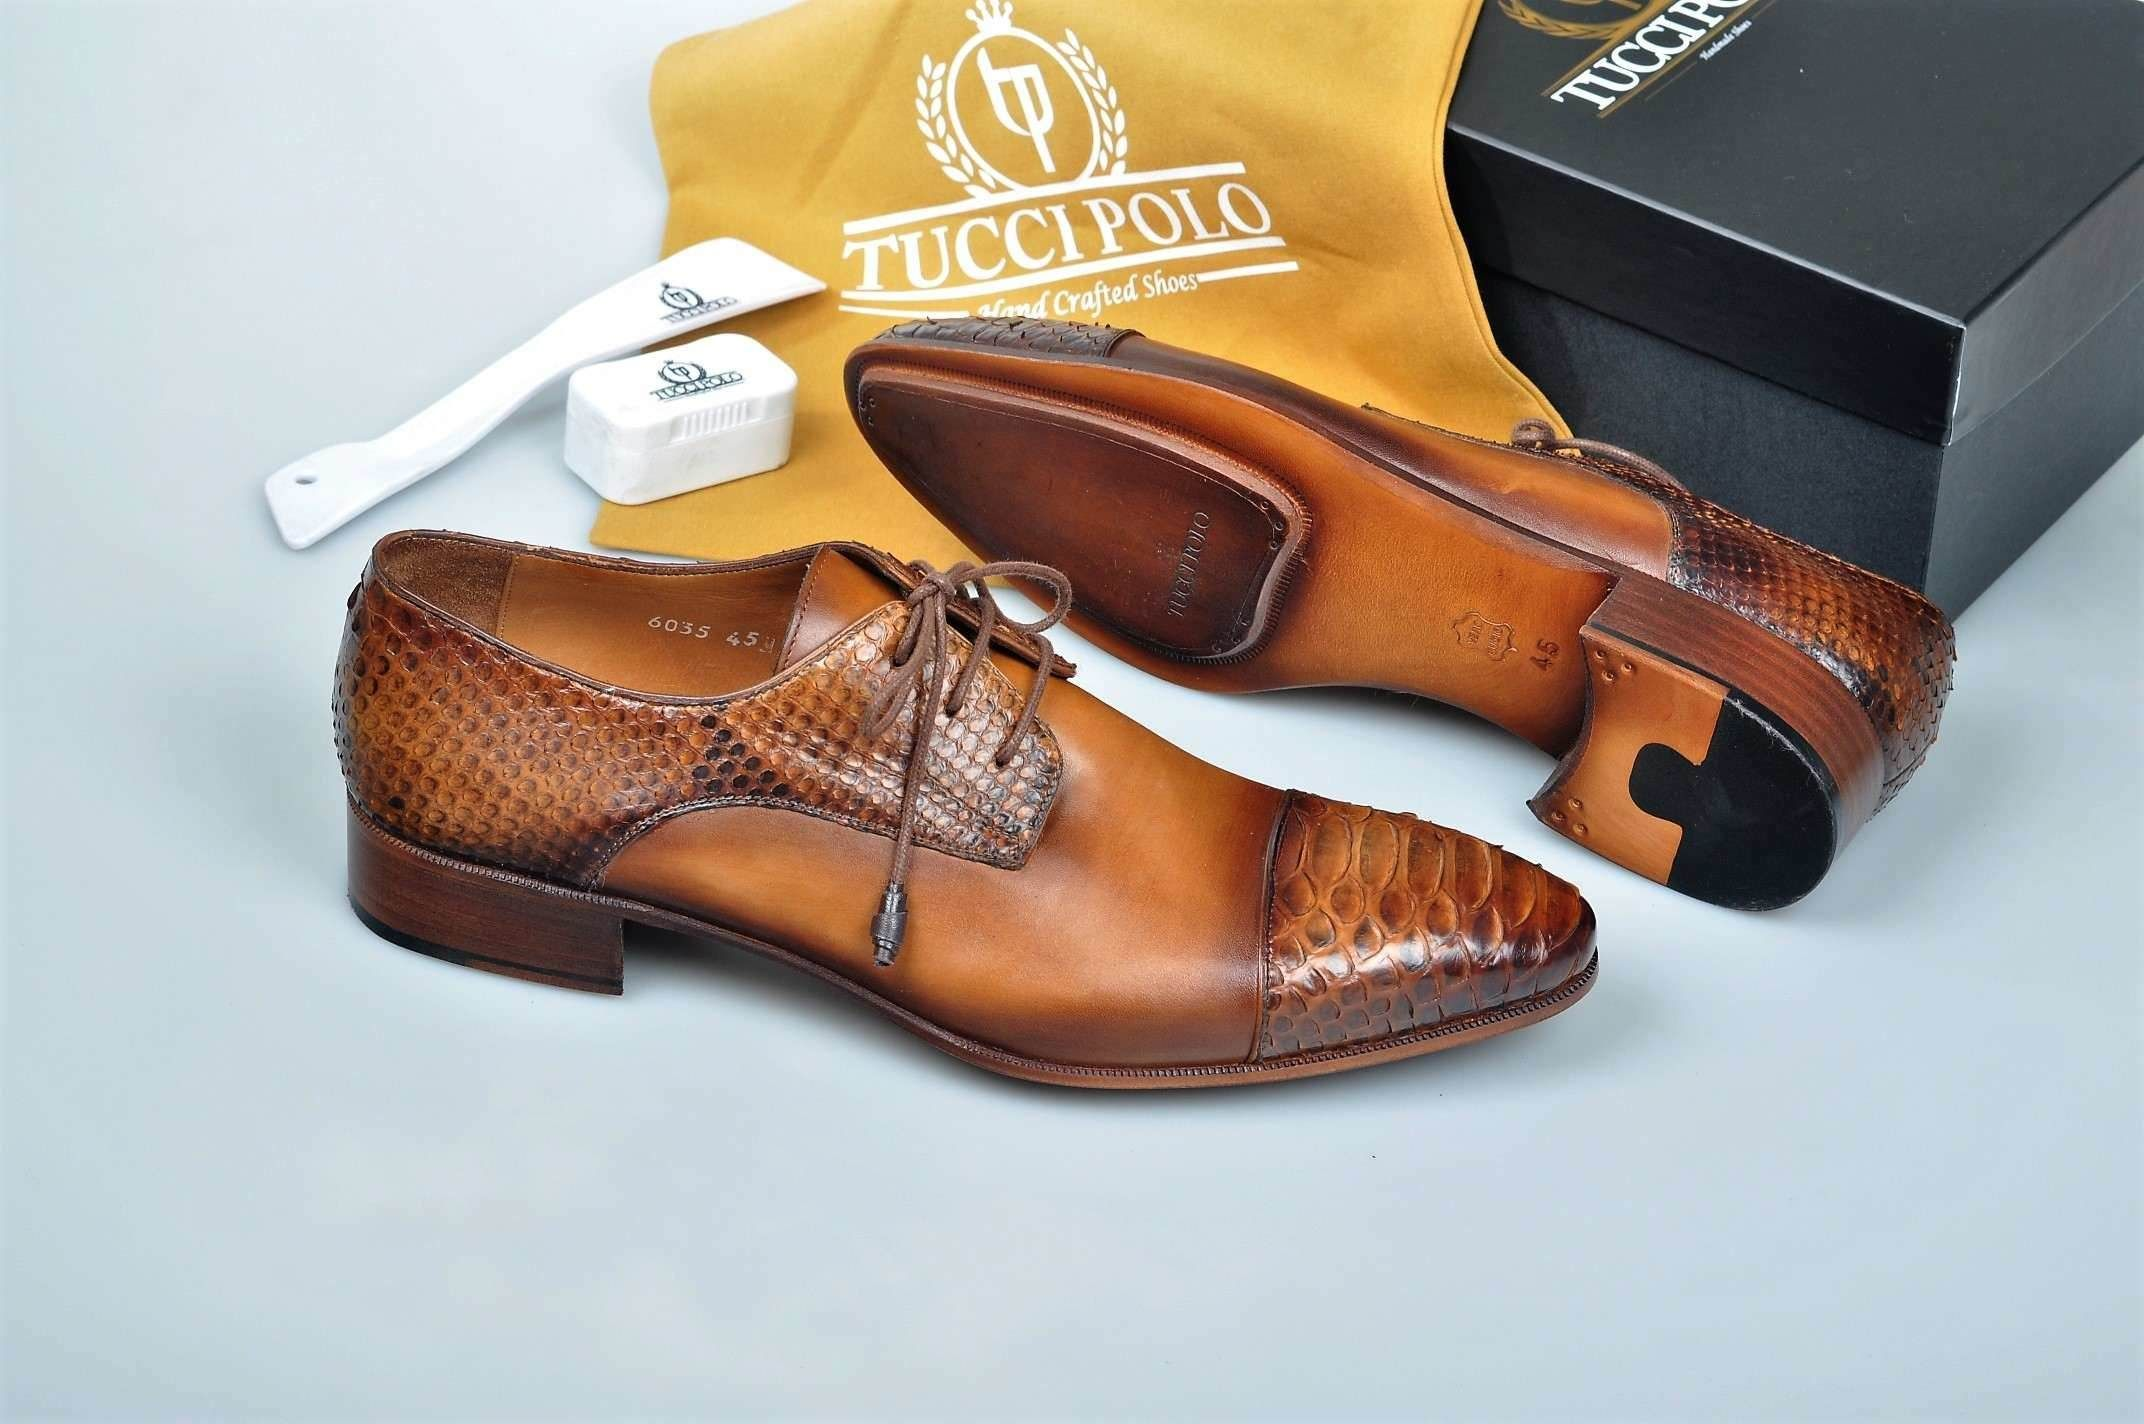 fadbee36e00 Welcome to TucciPolo Italian Leather Shoes